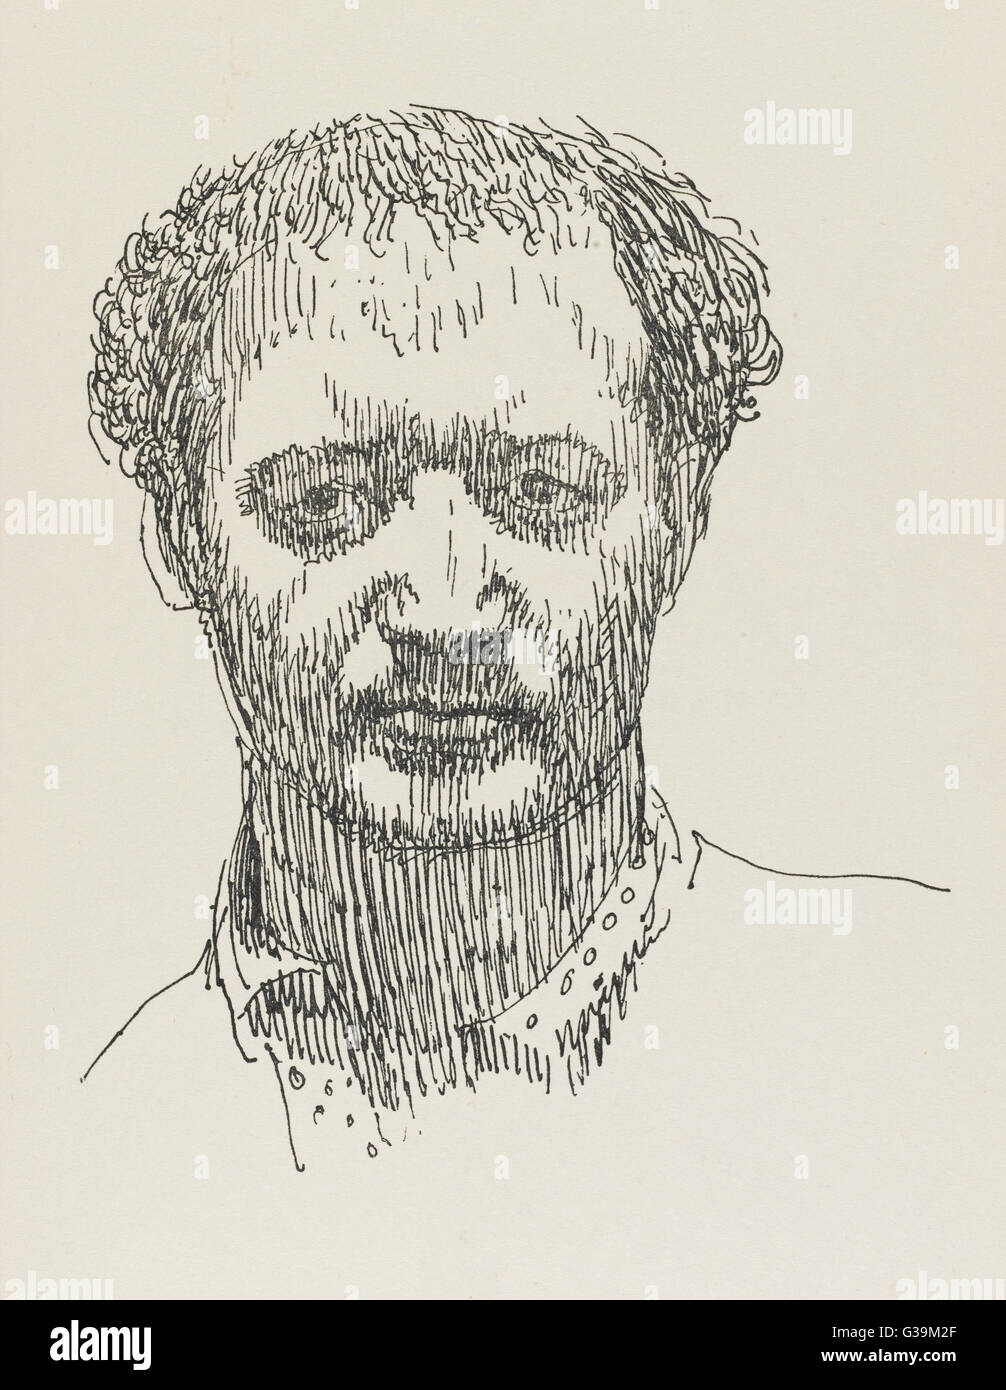 SIR JACOB EPSTEIN  Sculptor        Date: 1880 - 1959 - Stock Image